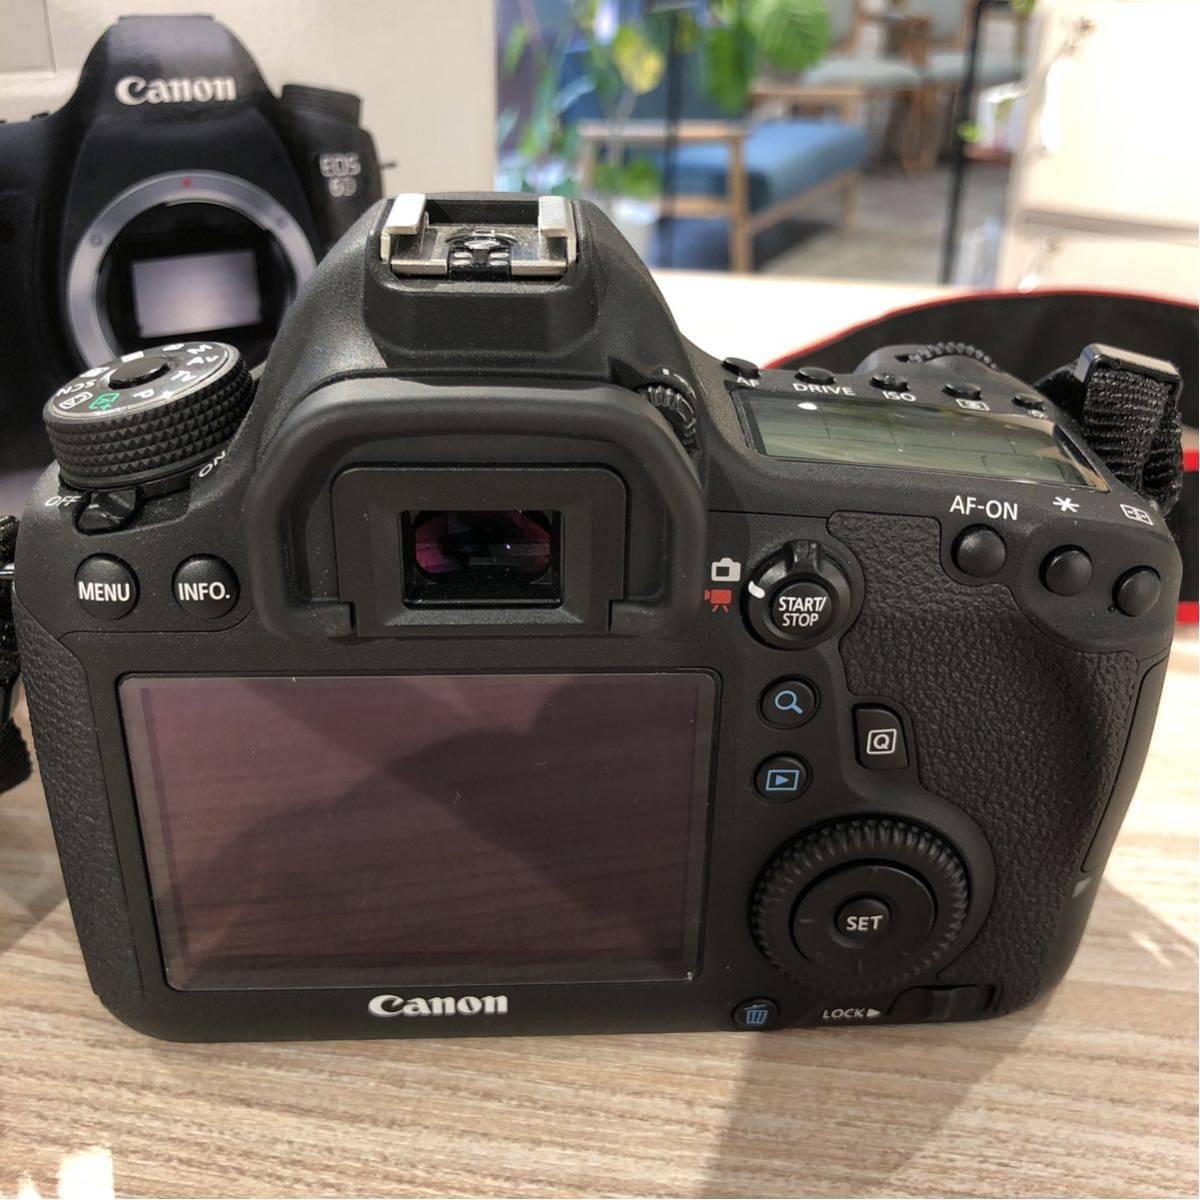 Canon キャノン 一眼レフ フルサイズ 6D ボディ 付属品完備_画像2